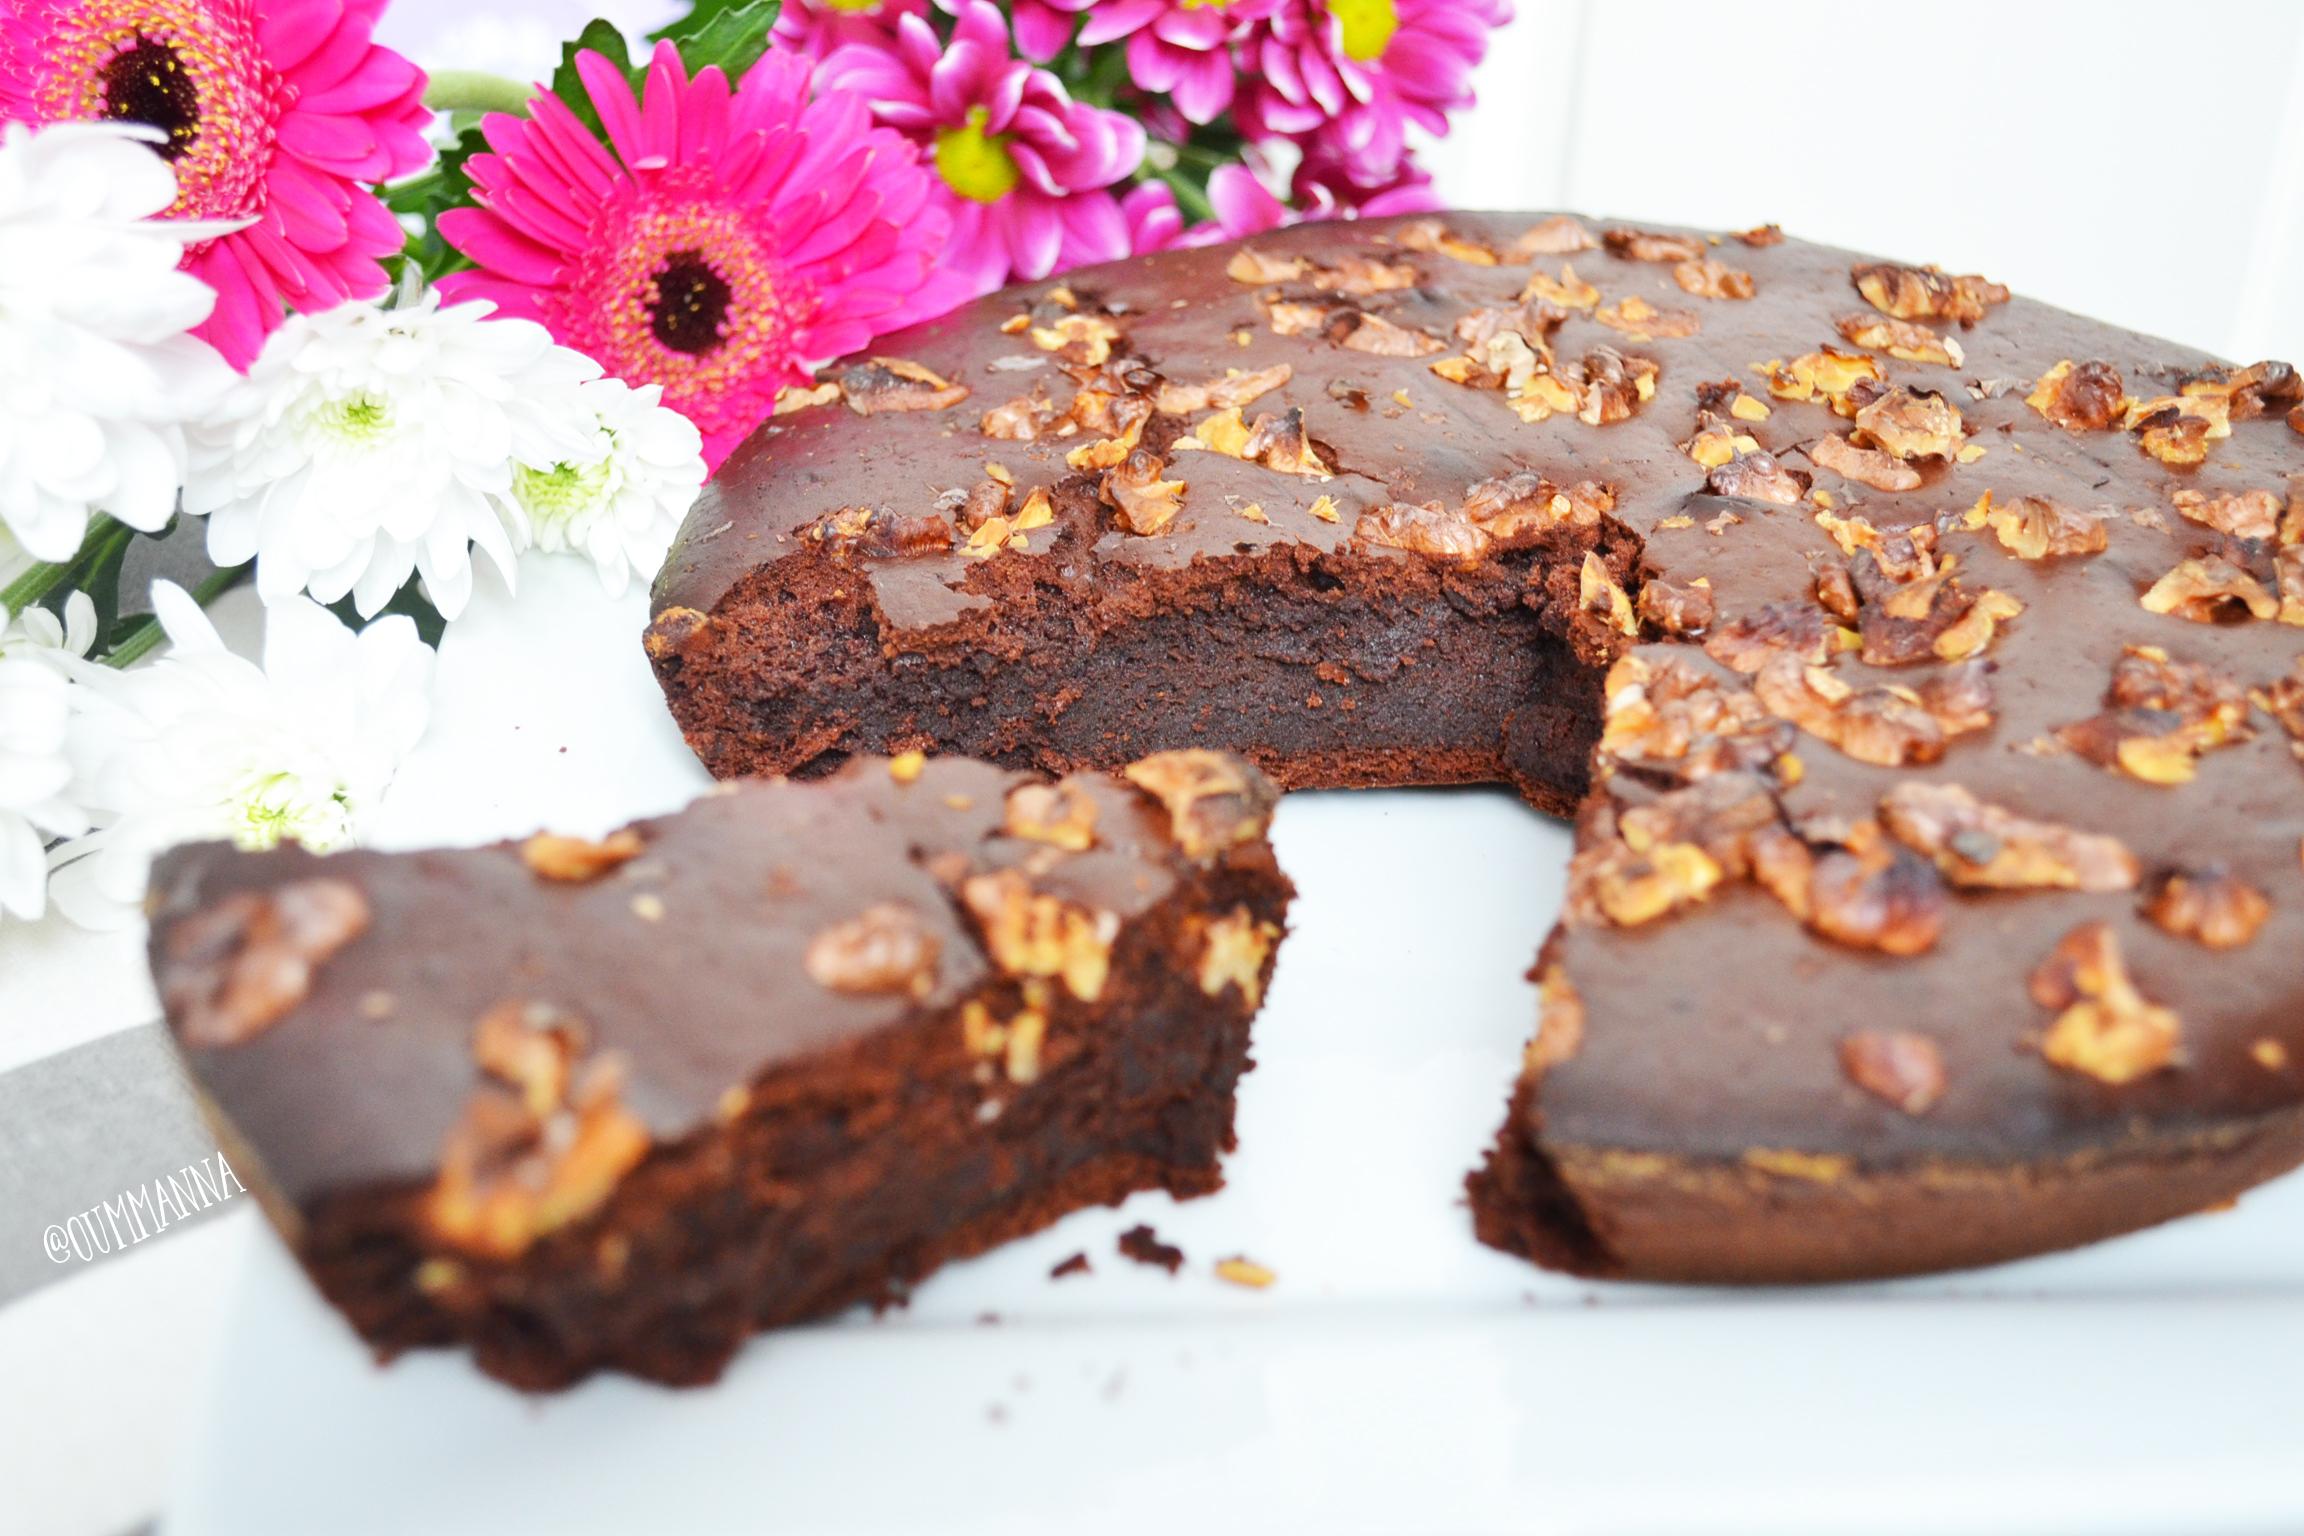 New Vegetarian treat Eggless Chocolate Fondant Cake recipe